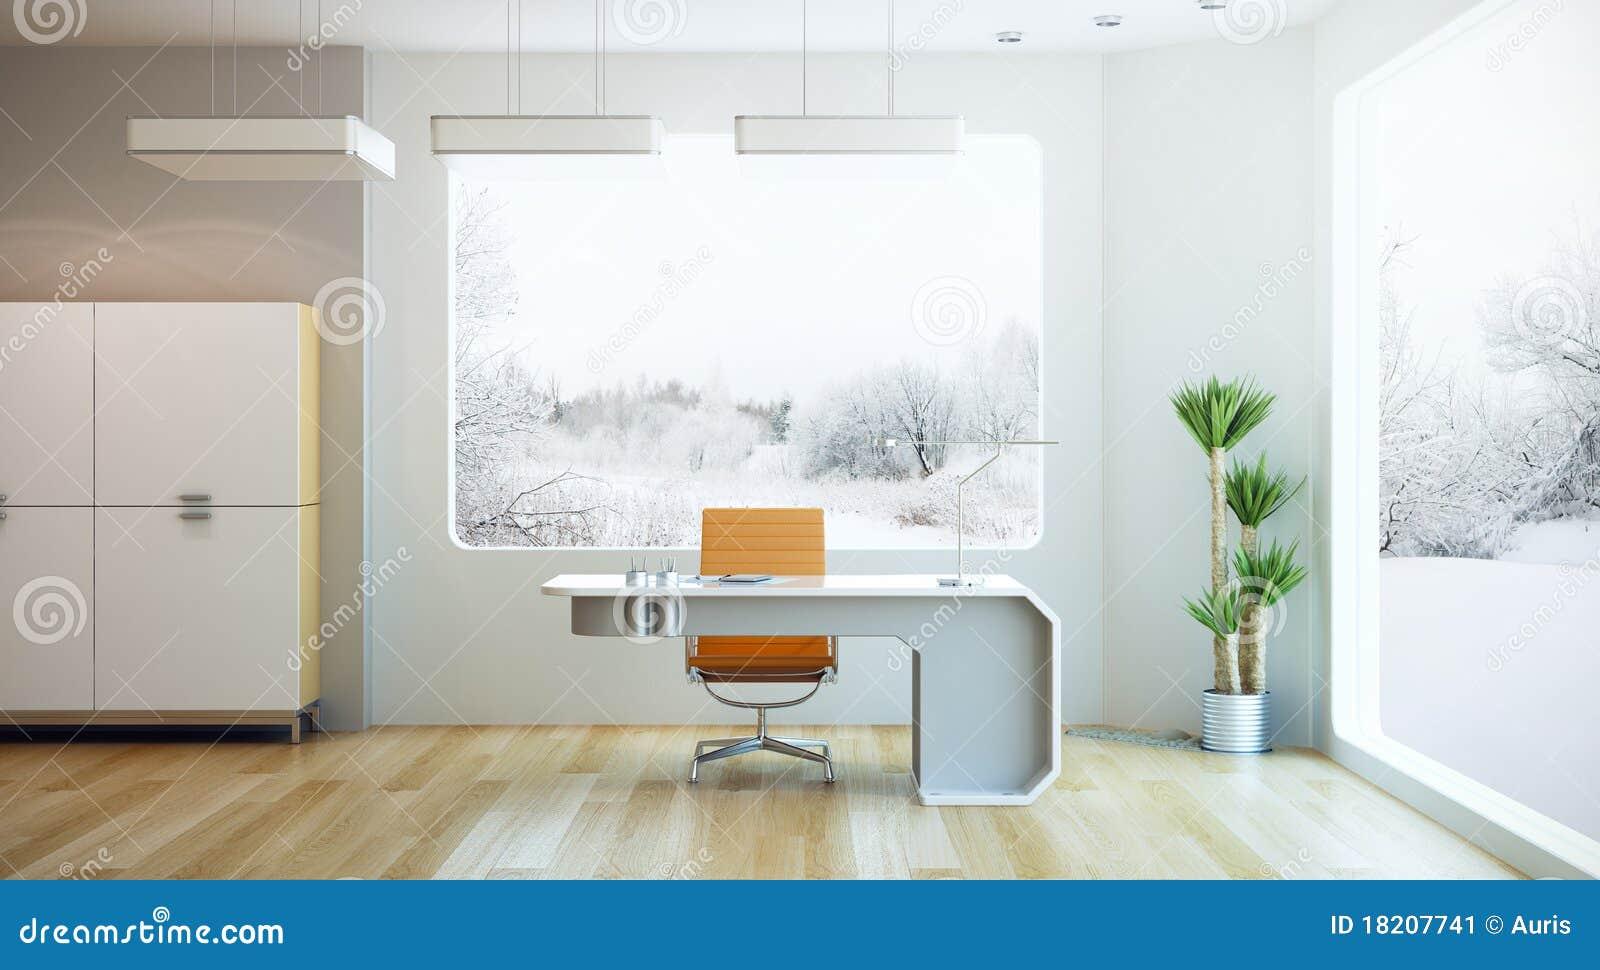 Dise o interior de oficina moderna imagen de archivo for Interior oficina